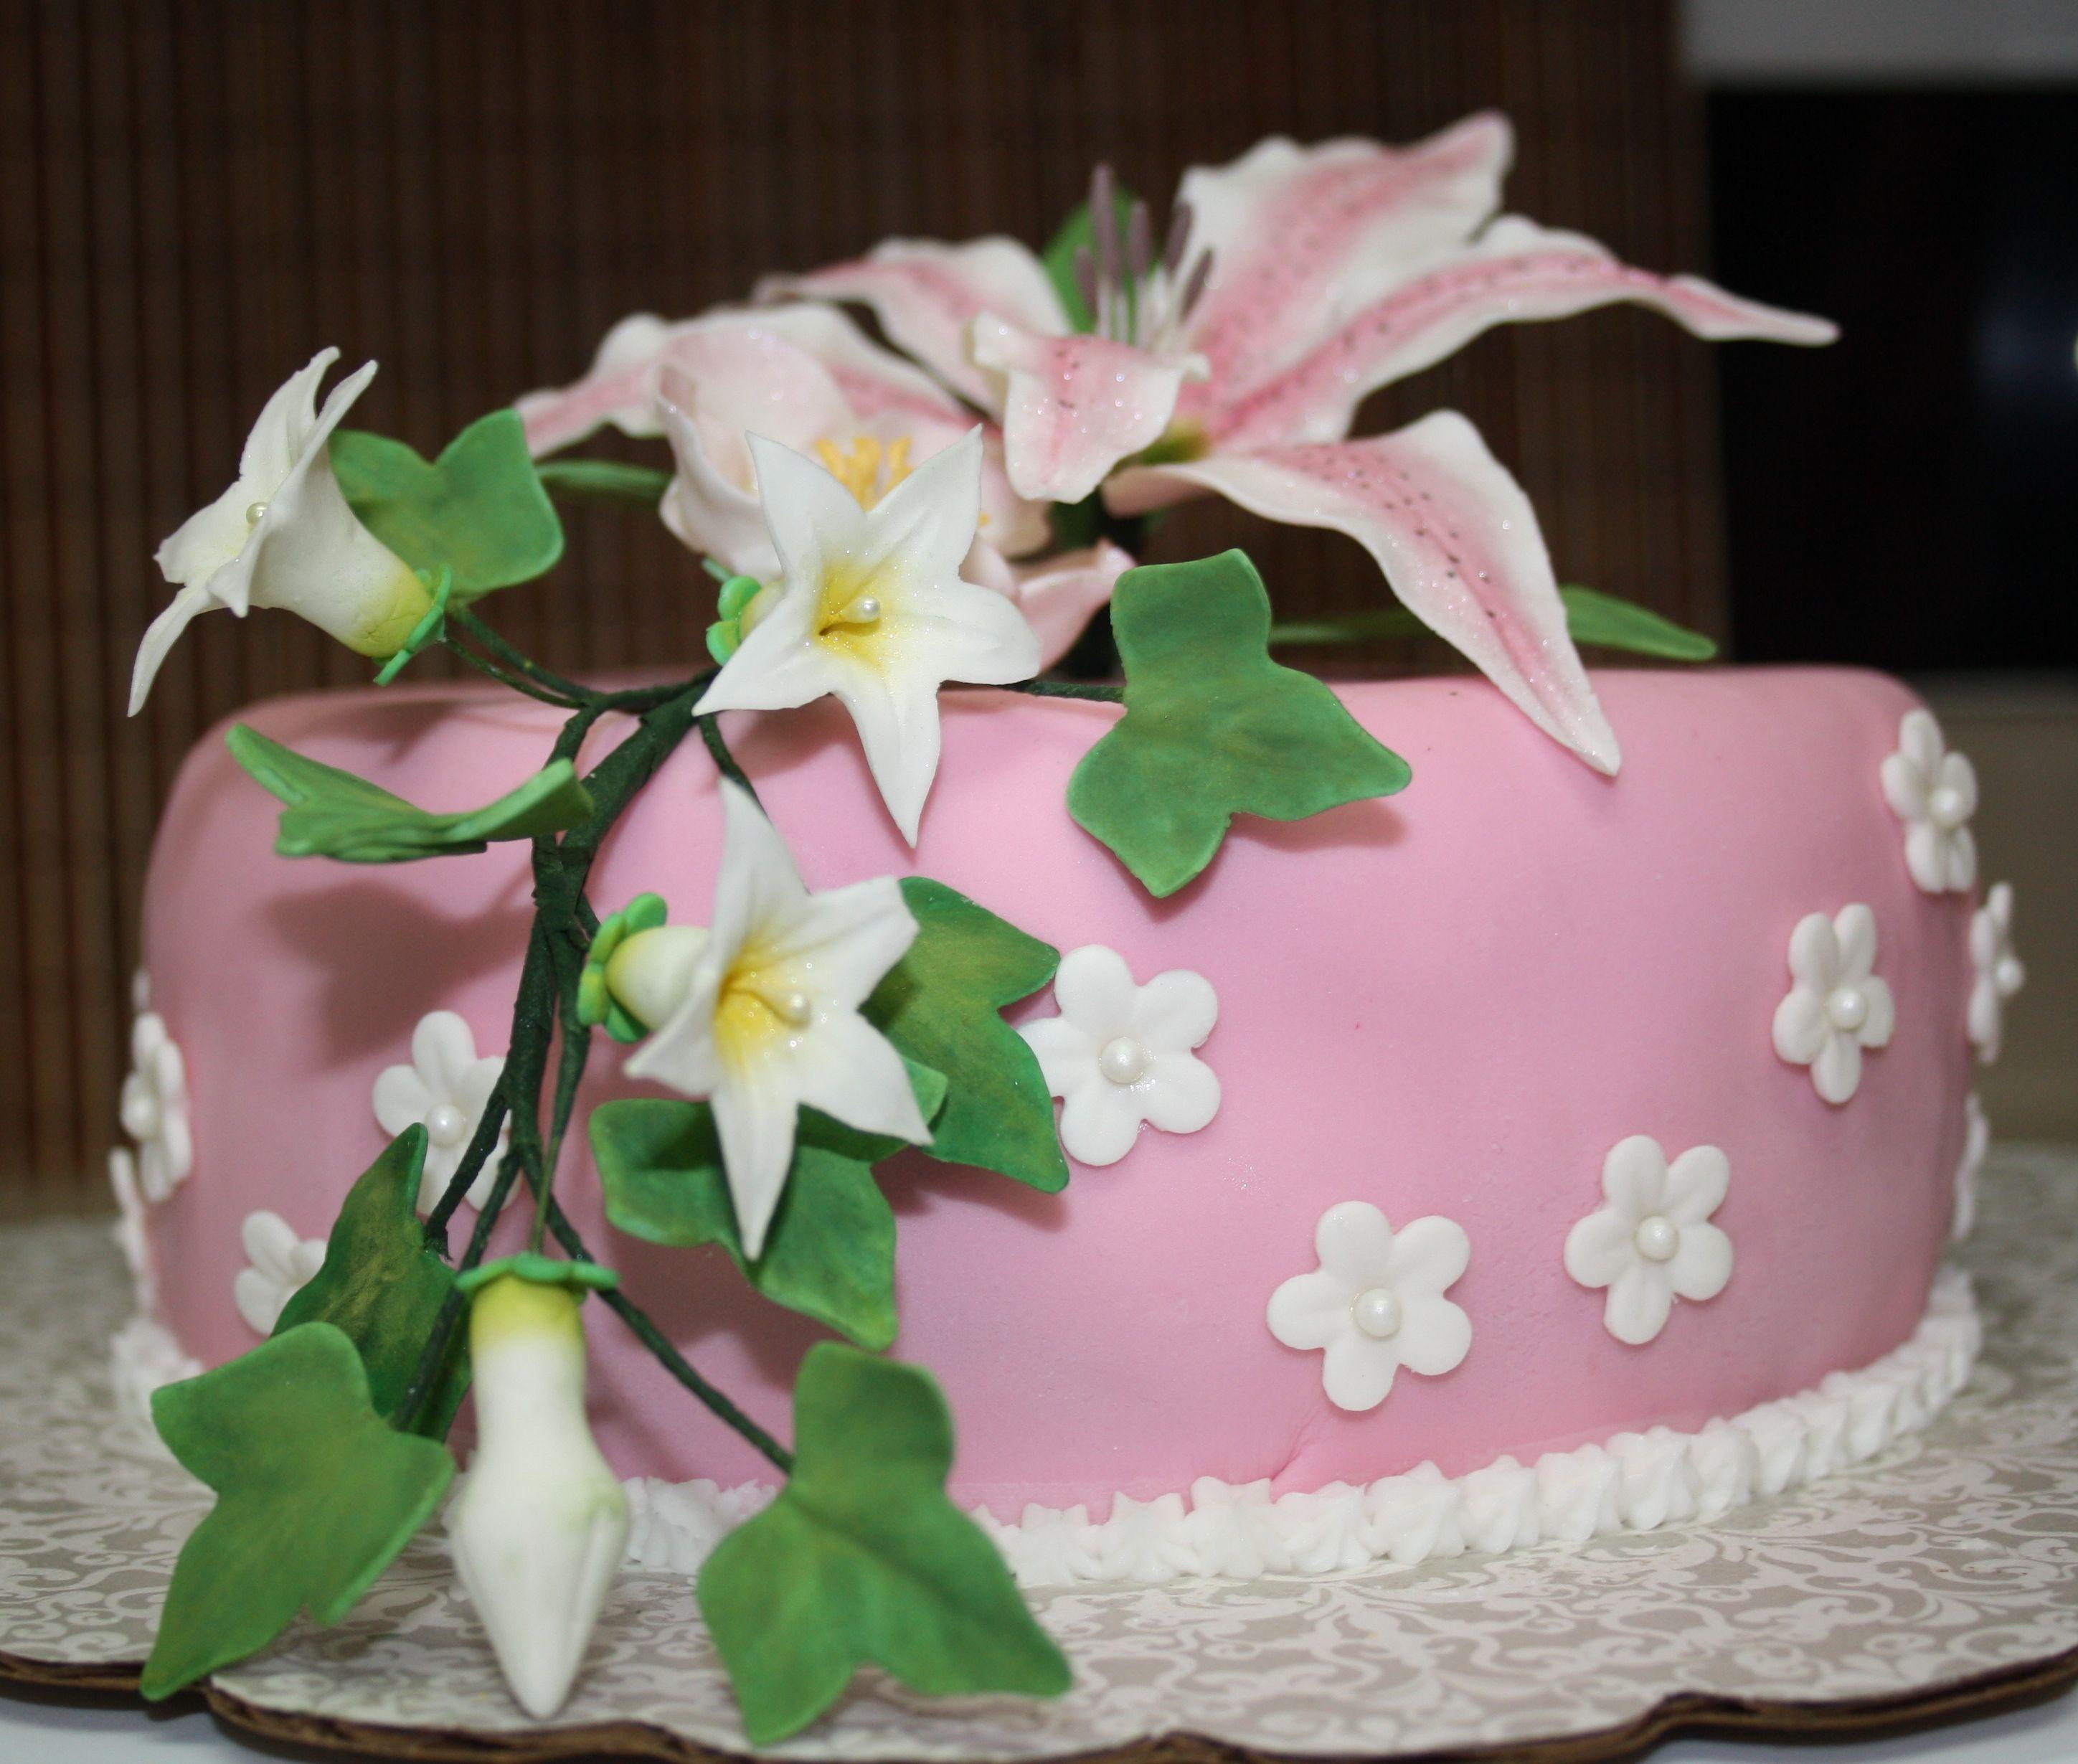 wiltoncontest cake for final class wilton method course 4 advanced gum paste flowers - Michaels Cake Decorating Class